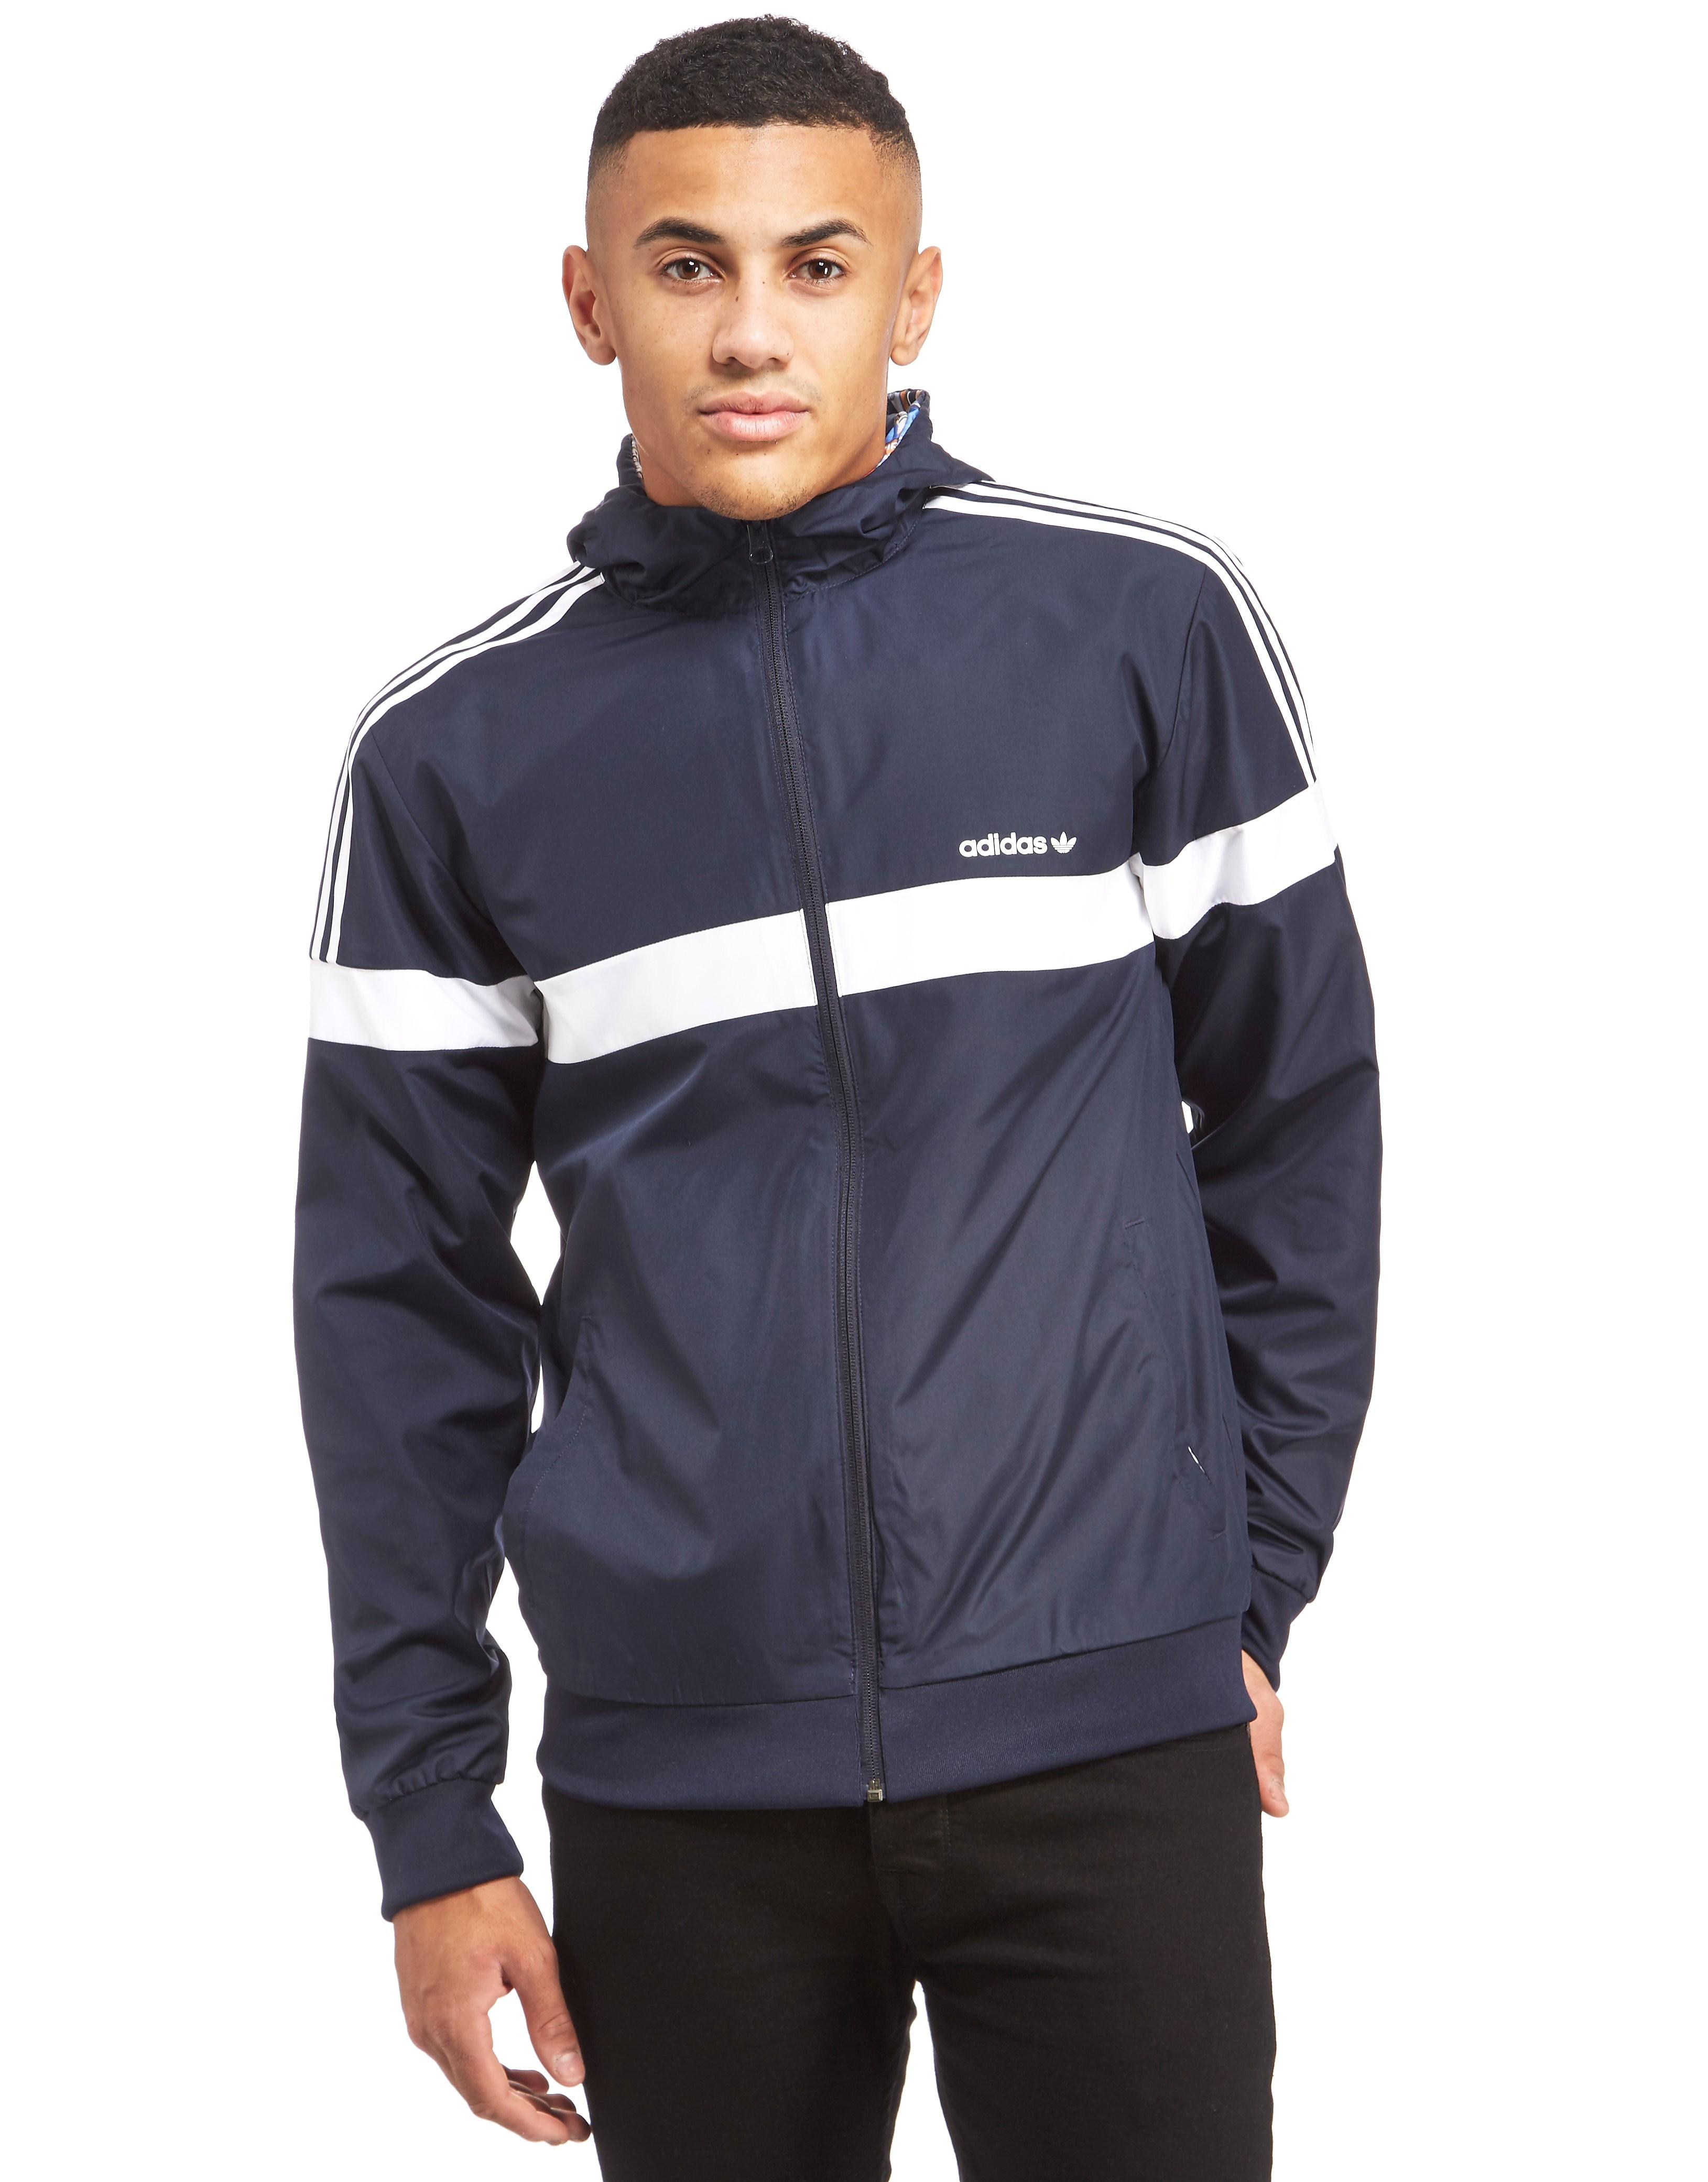 adidas Originals Itasca Collection Reversible Windbreaker Jacket